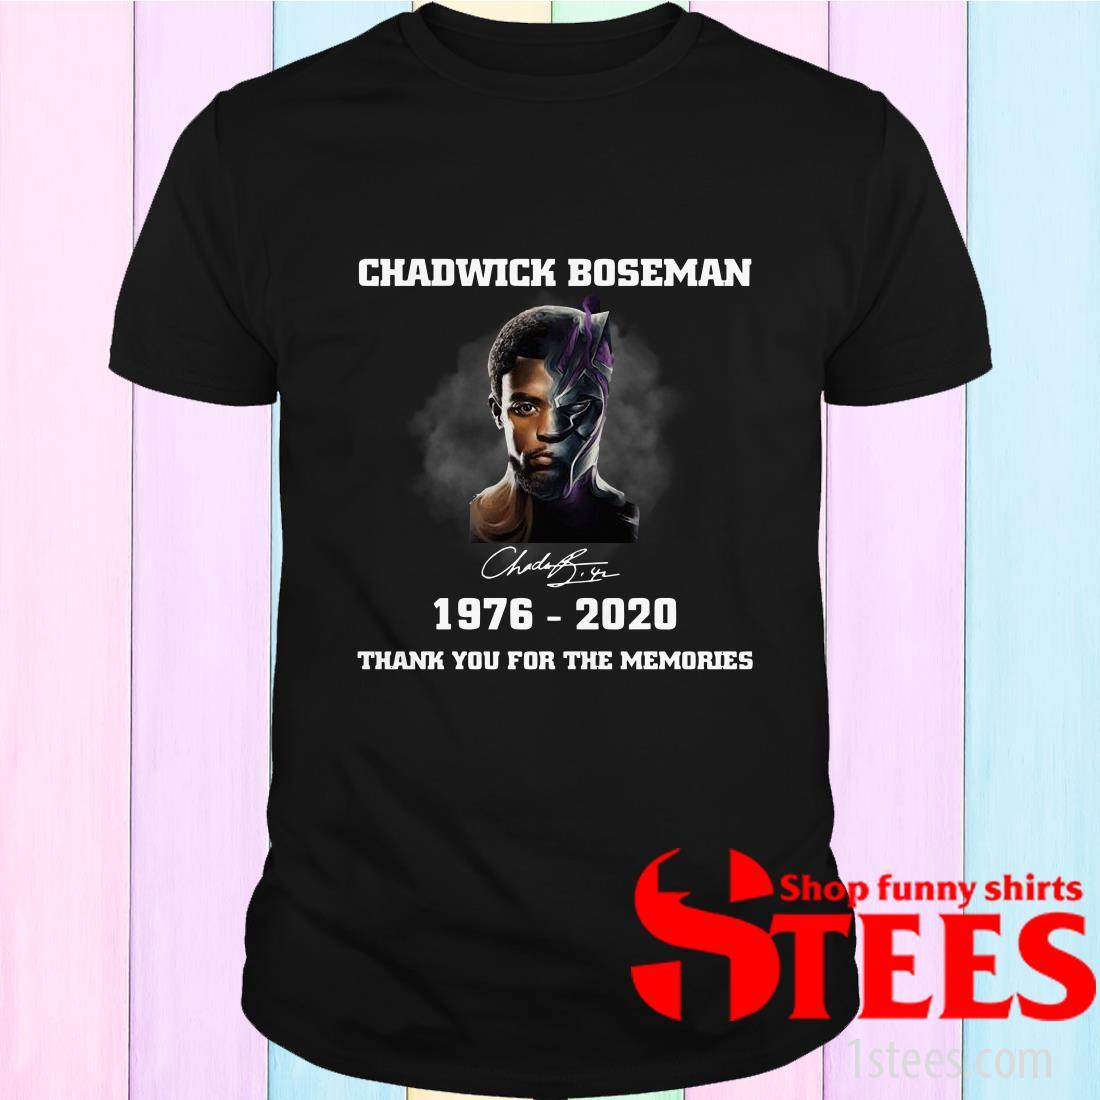 Chadwick Boseman Signature 1976-2020 Thank You For The Memories T-Shirt